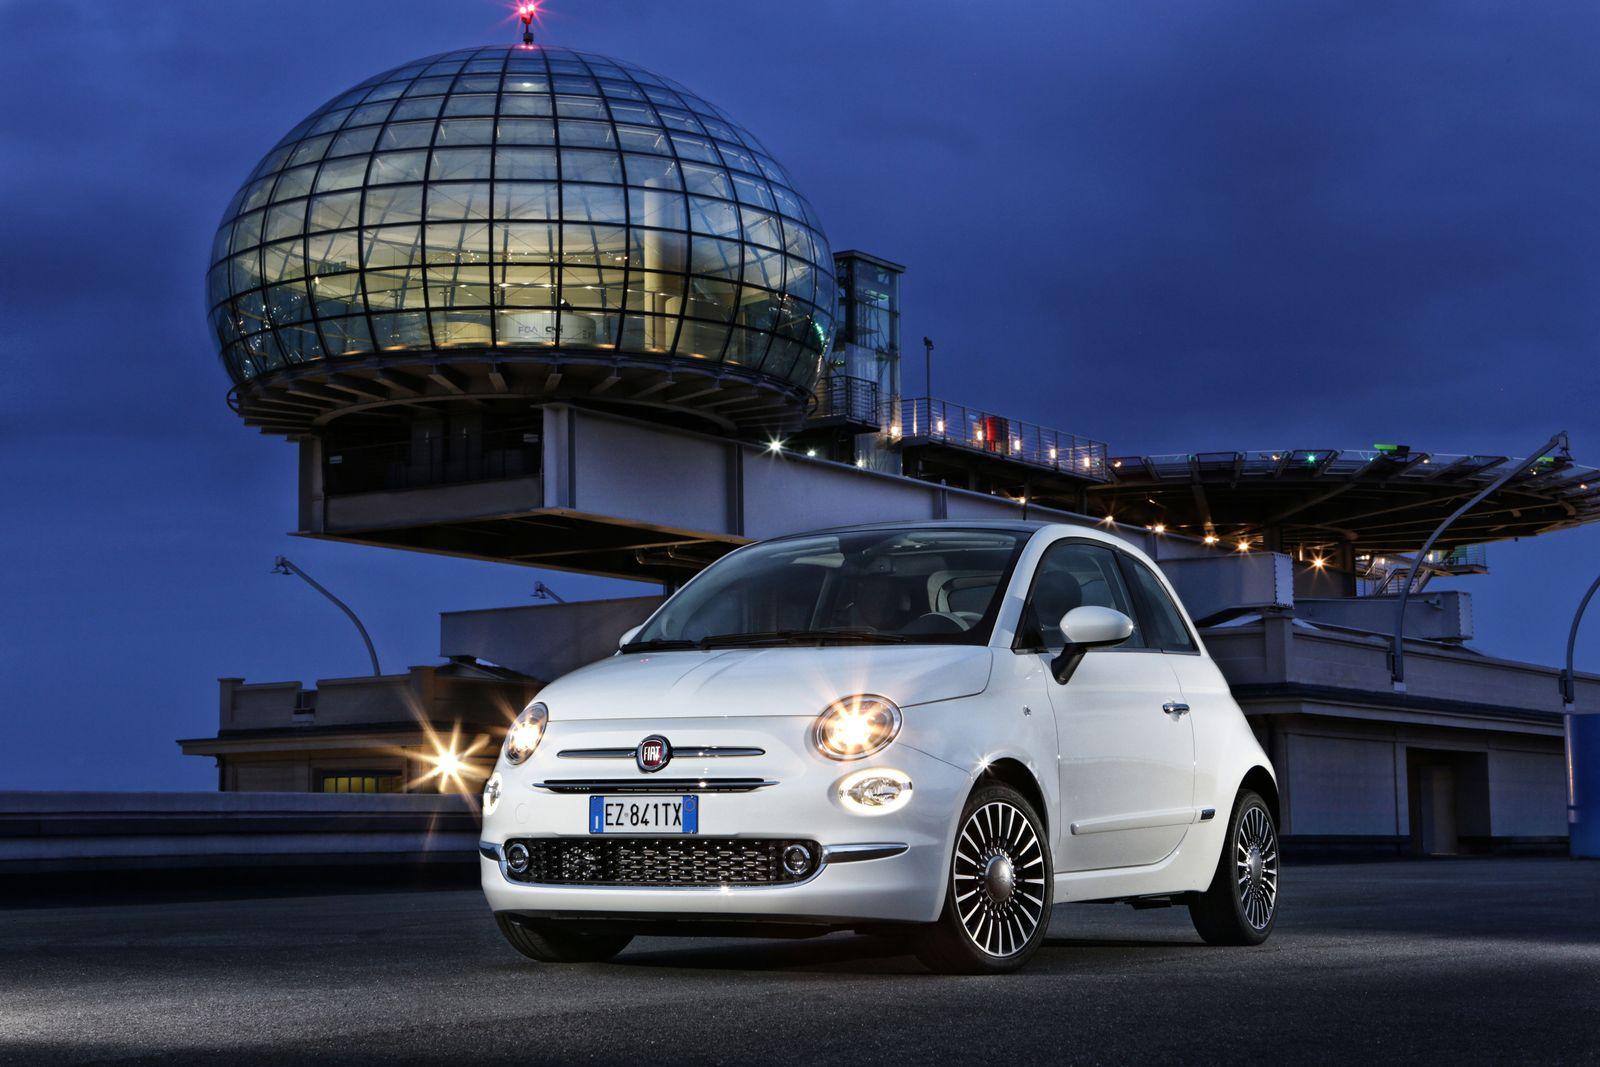 2015 Fiat 500/ Auto Trophy